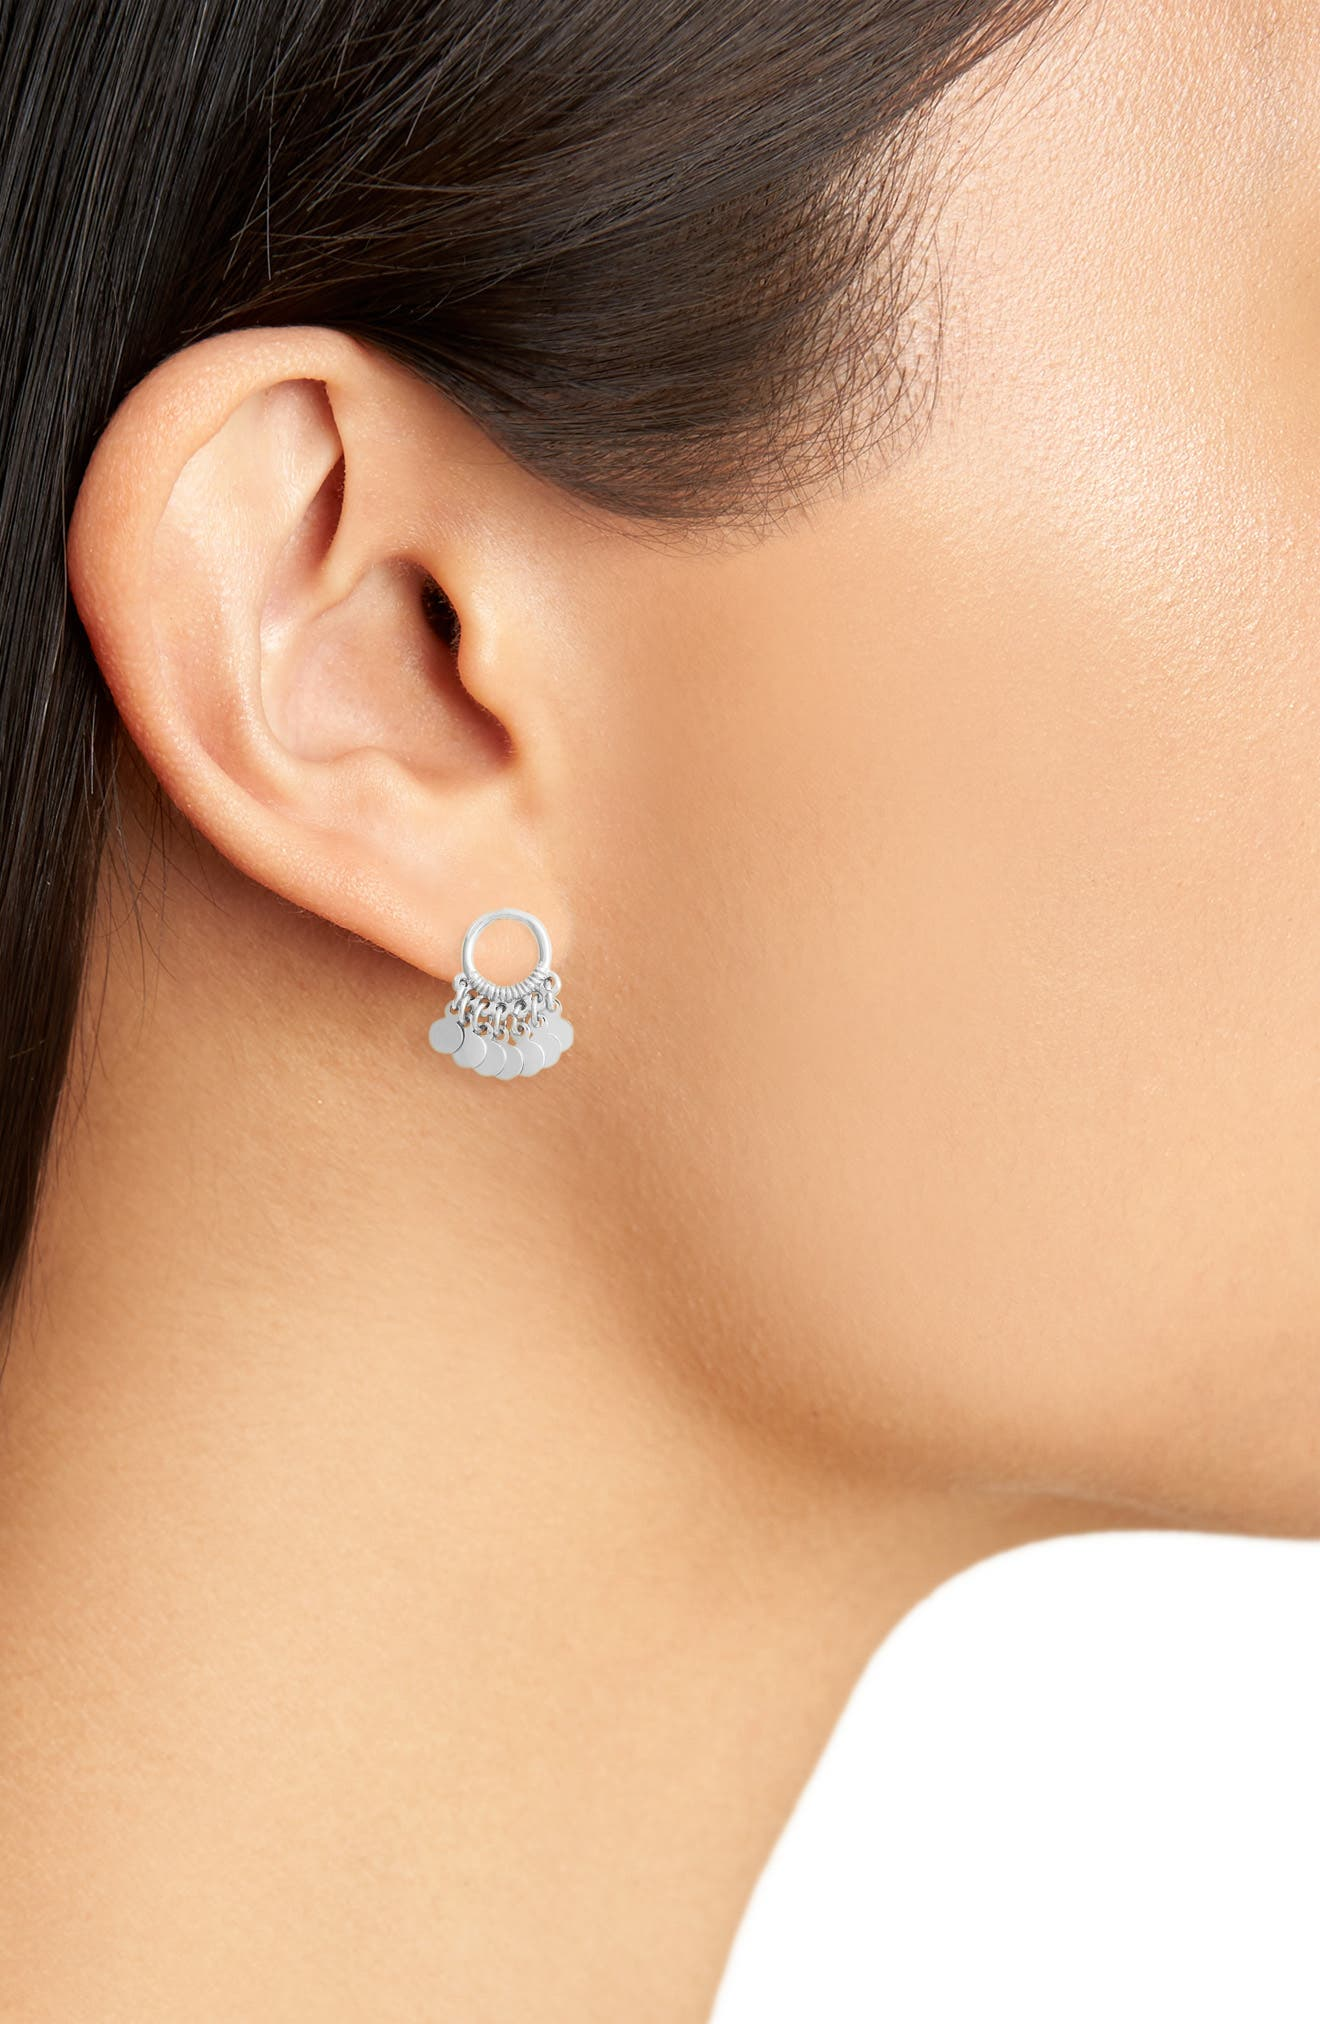 Vermeil Frontal Drop Earrings,                             Alternate thumbnail 2, color,                             SILVER